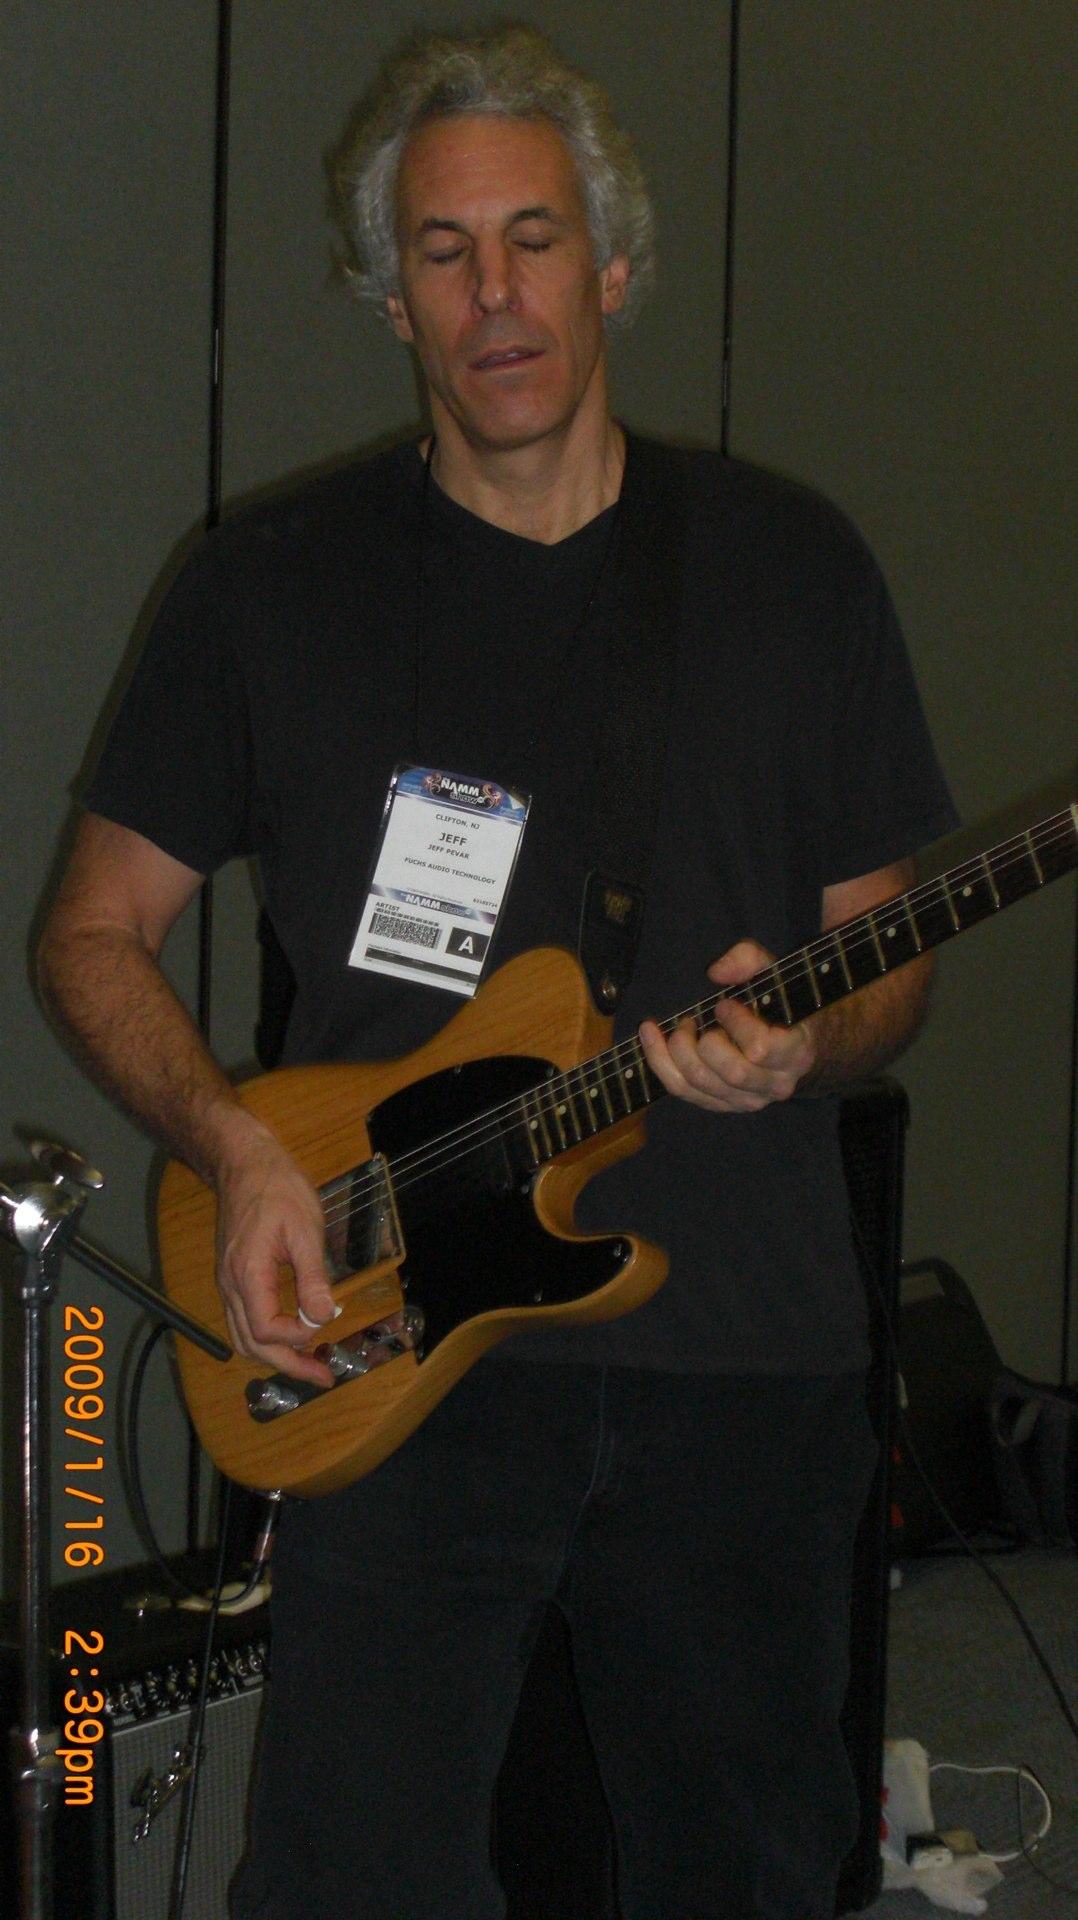 Jeff Pevar NAMM rehearsal 08